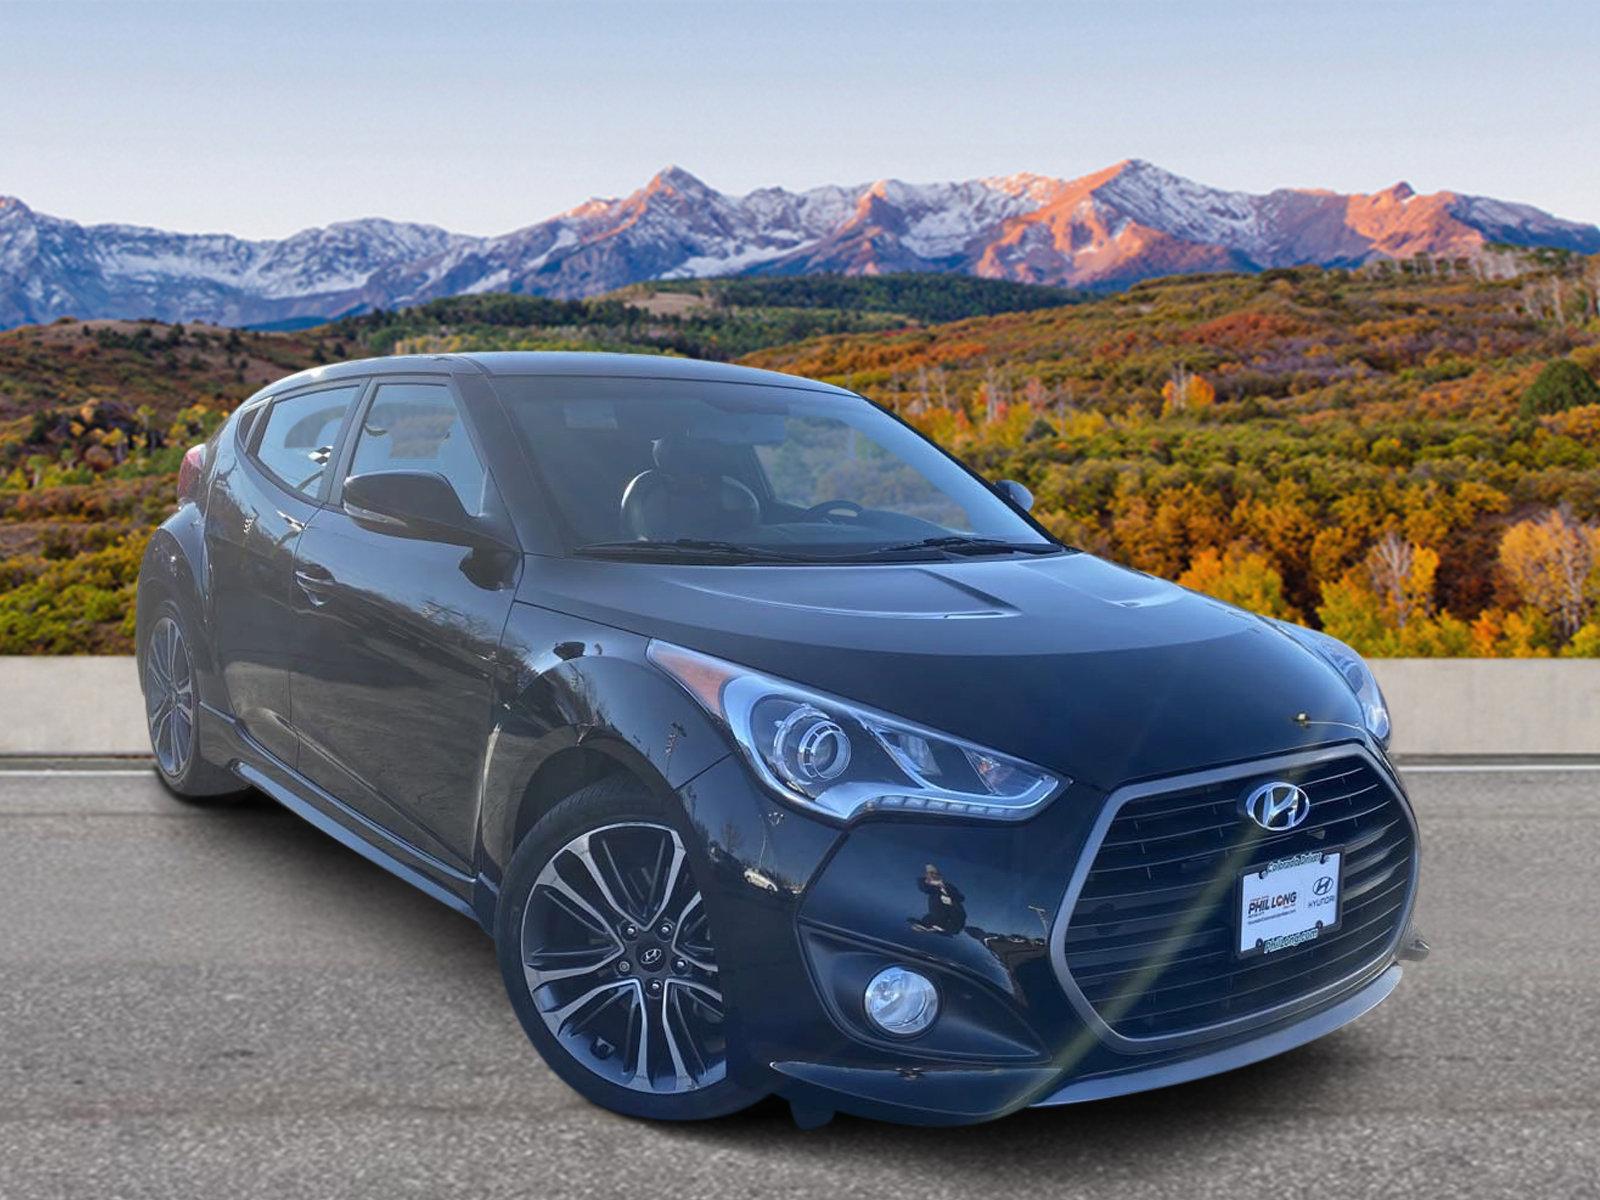 2016 Hyundai Veloster Turbo image